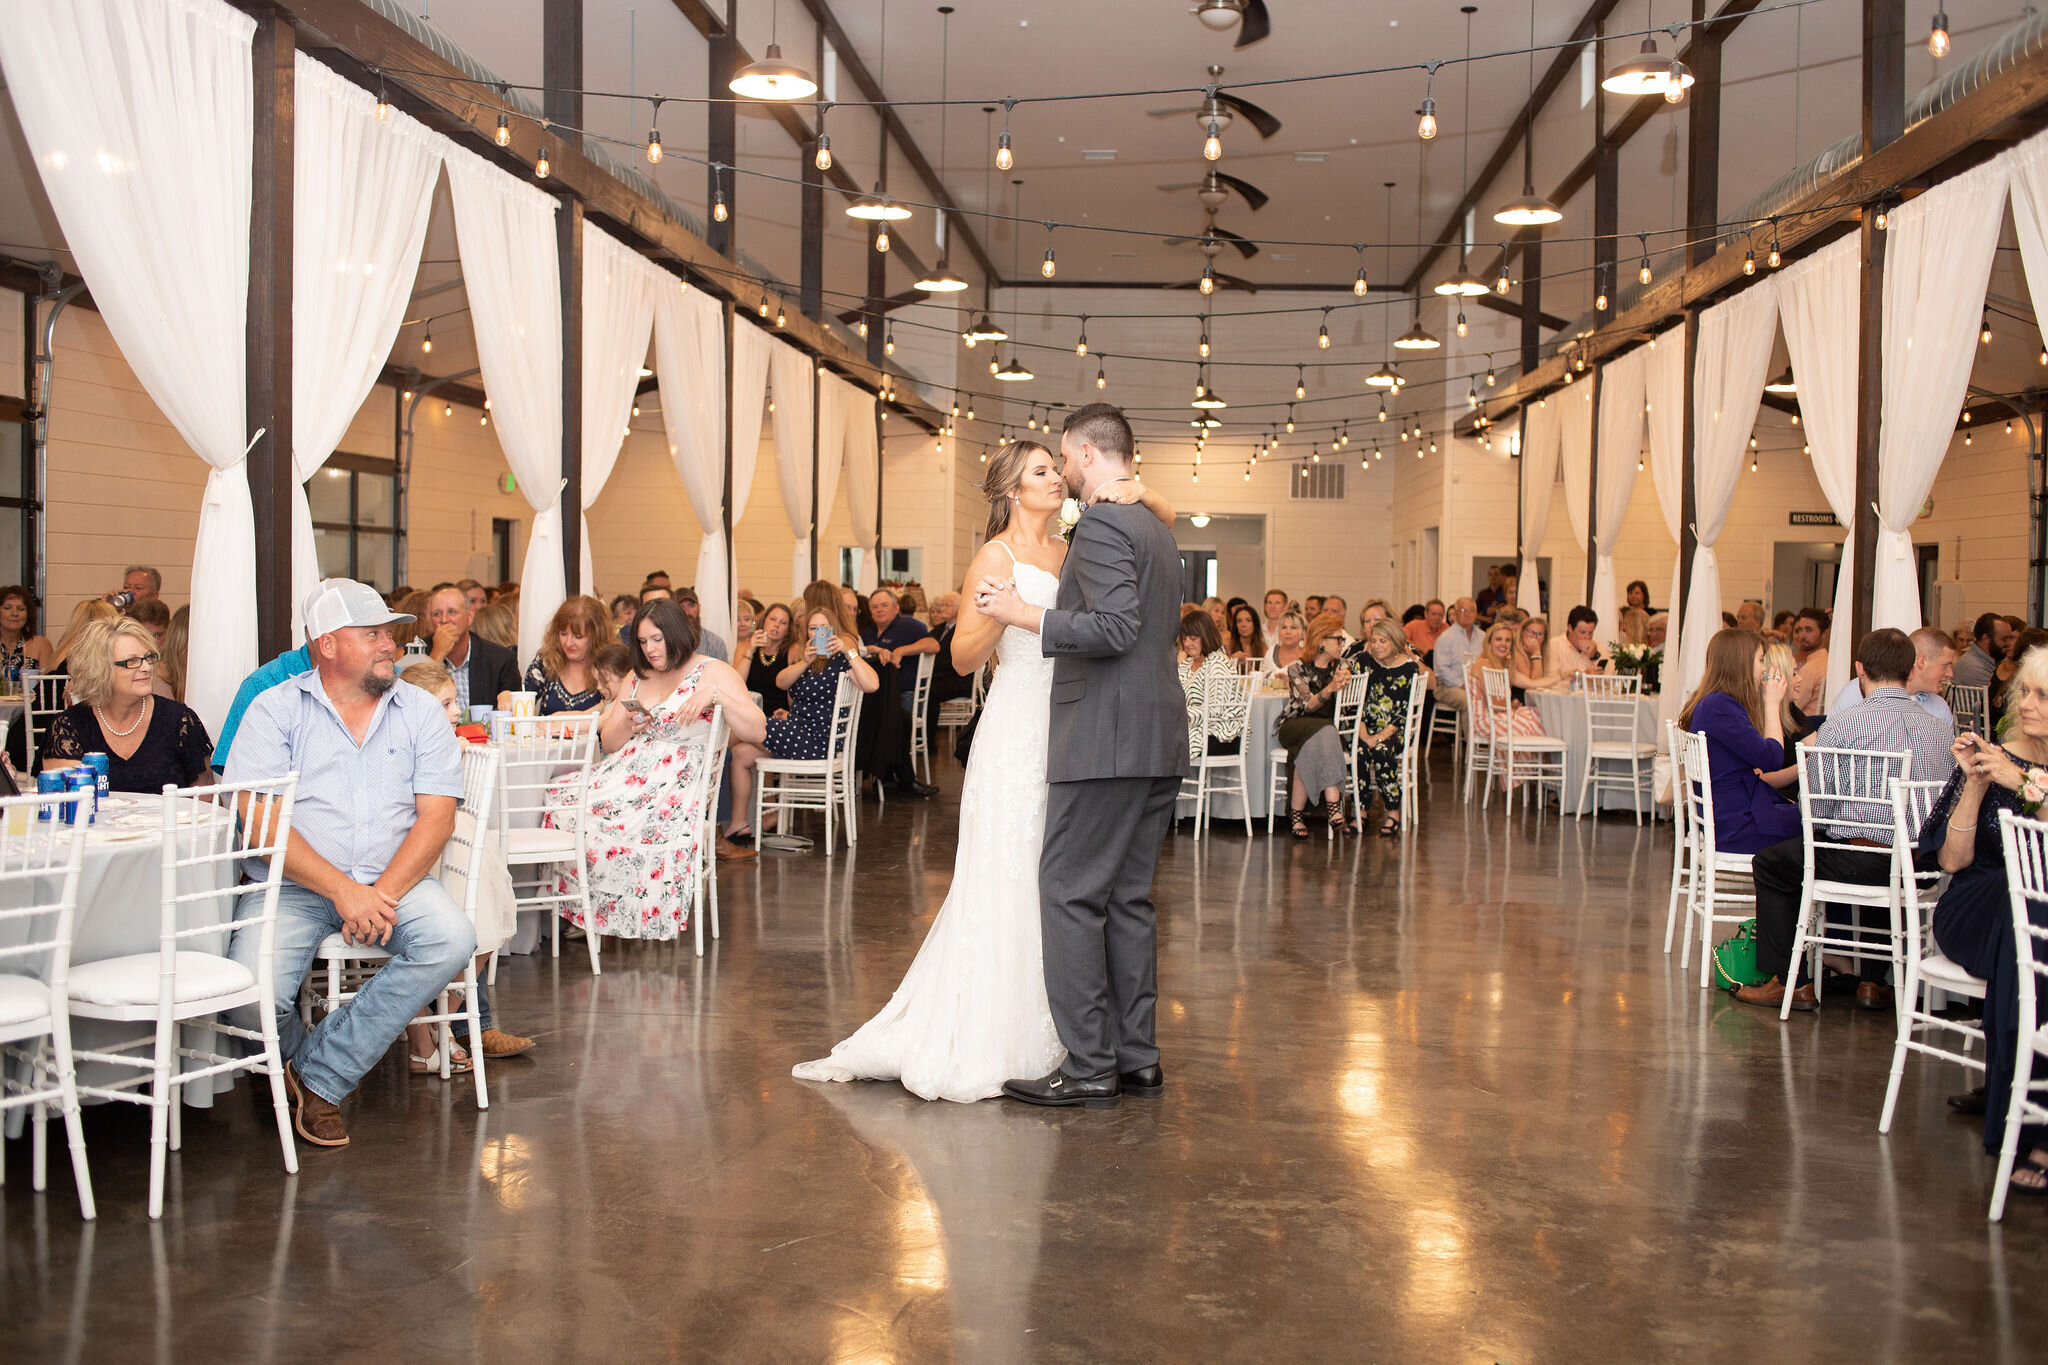 Oklahoma Summer Wedding Venue Dream Point Ranch 44.jpg